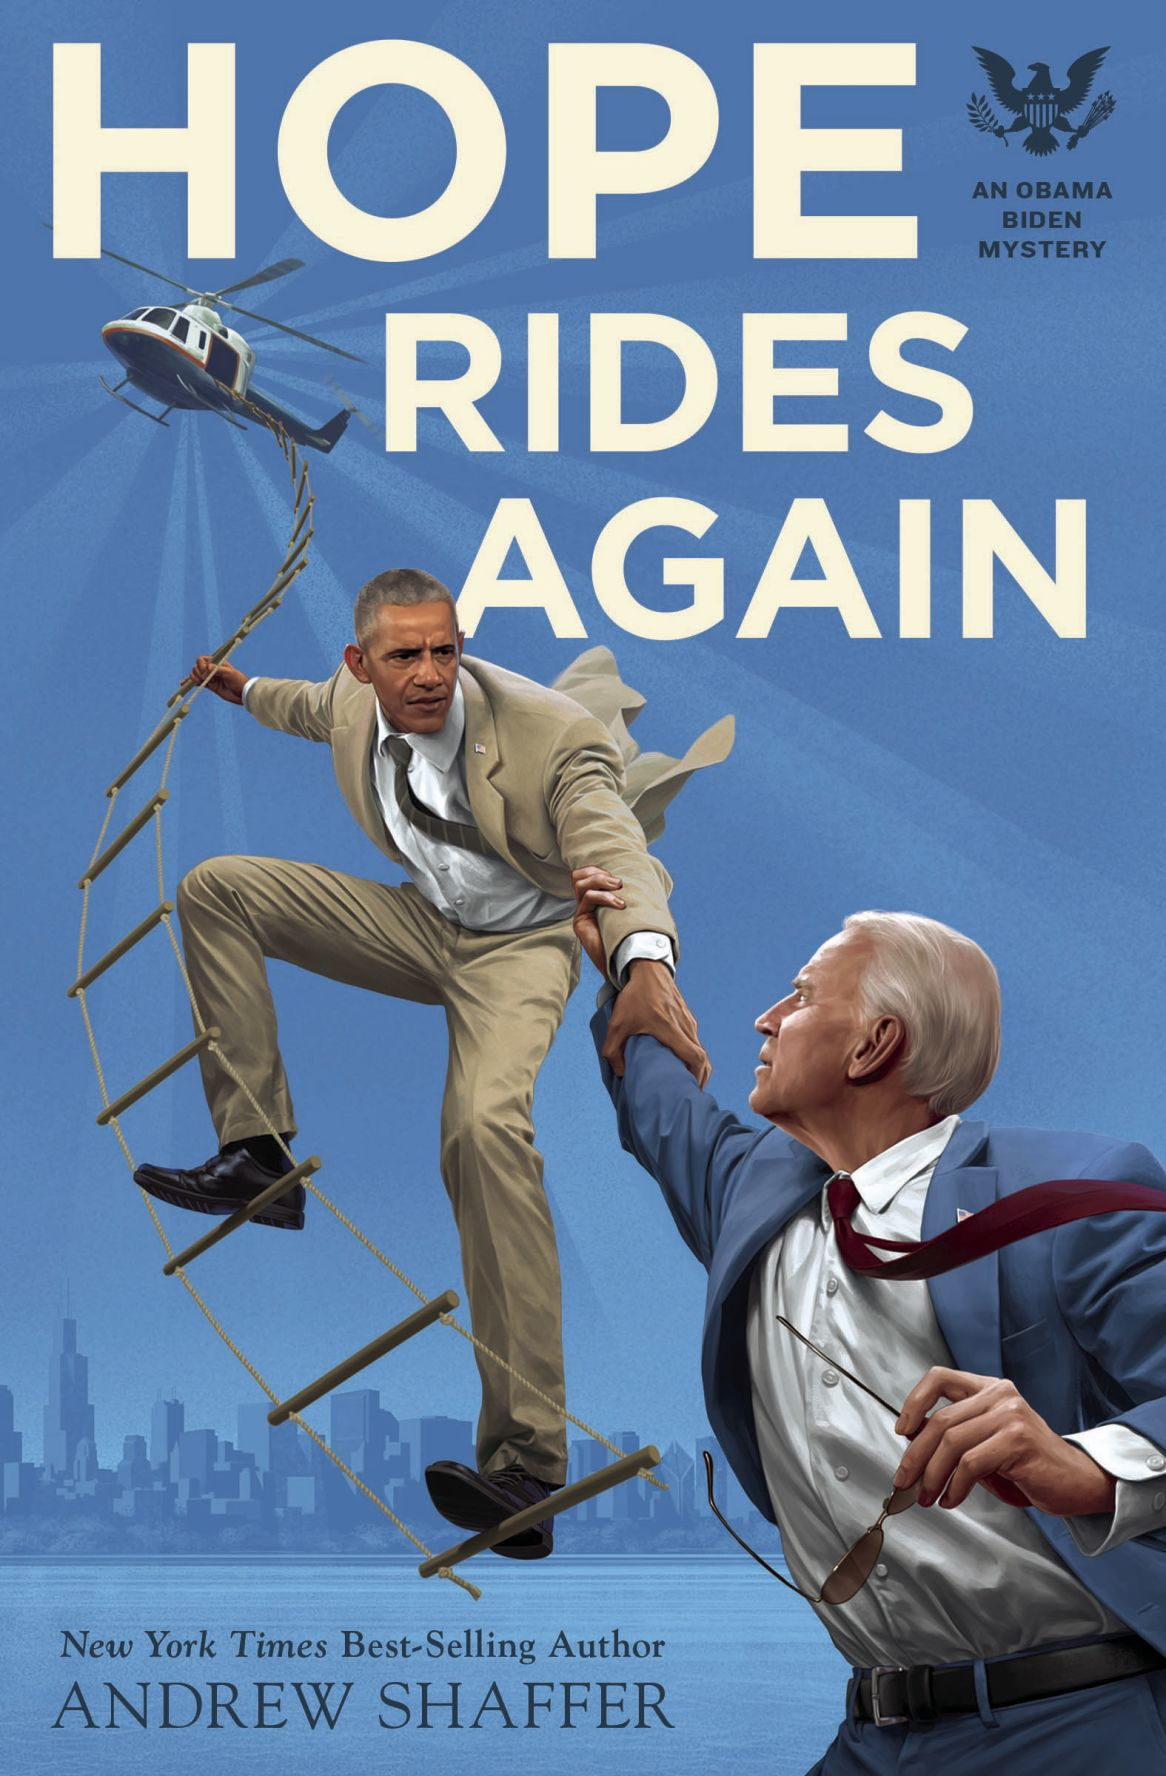 Obama/Biden mystery author to make stop in Madison | Entertainment